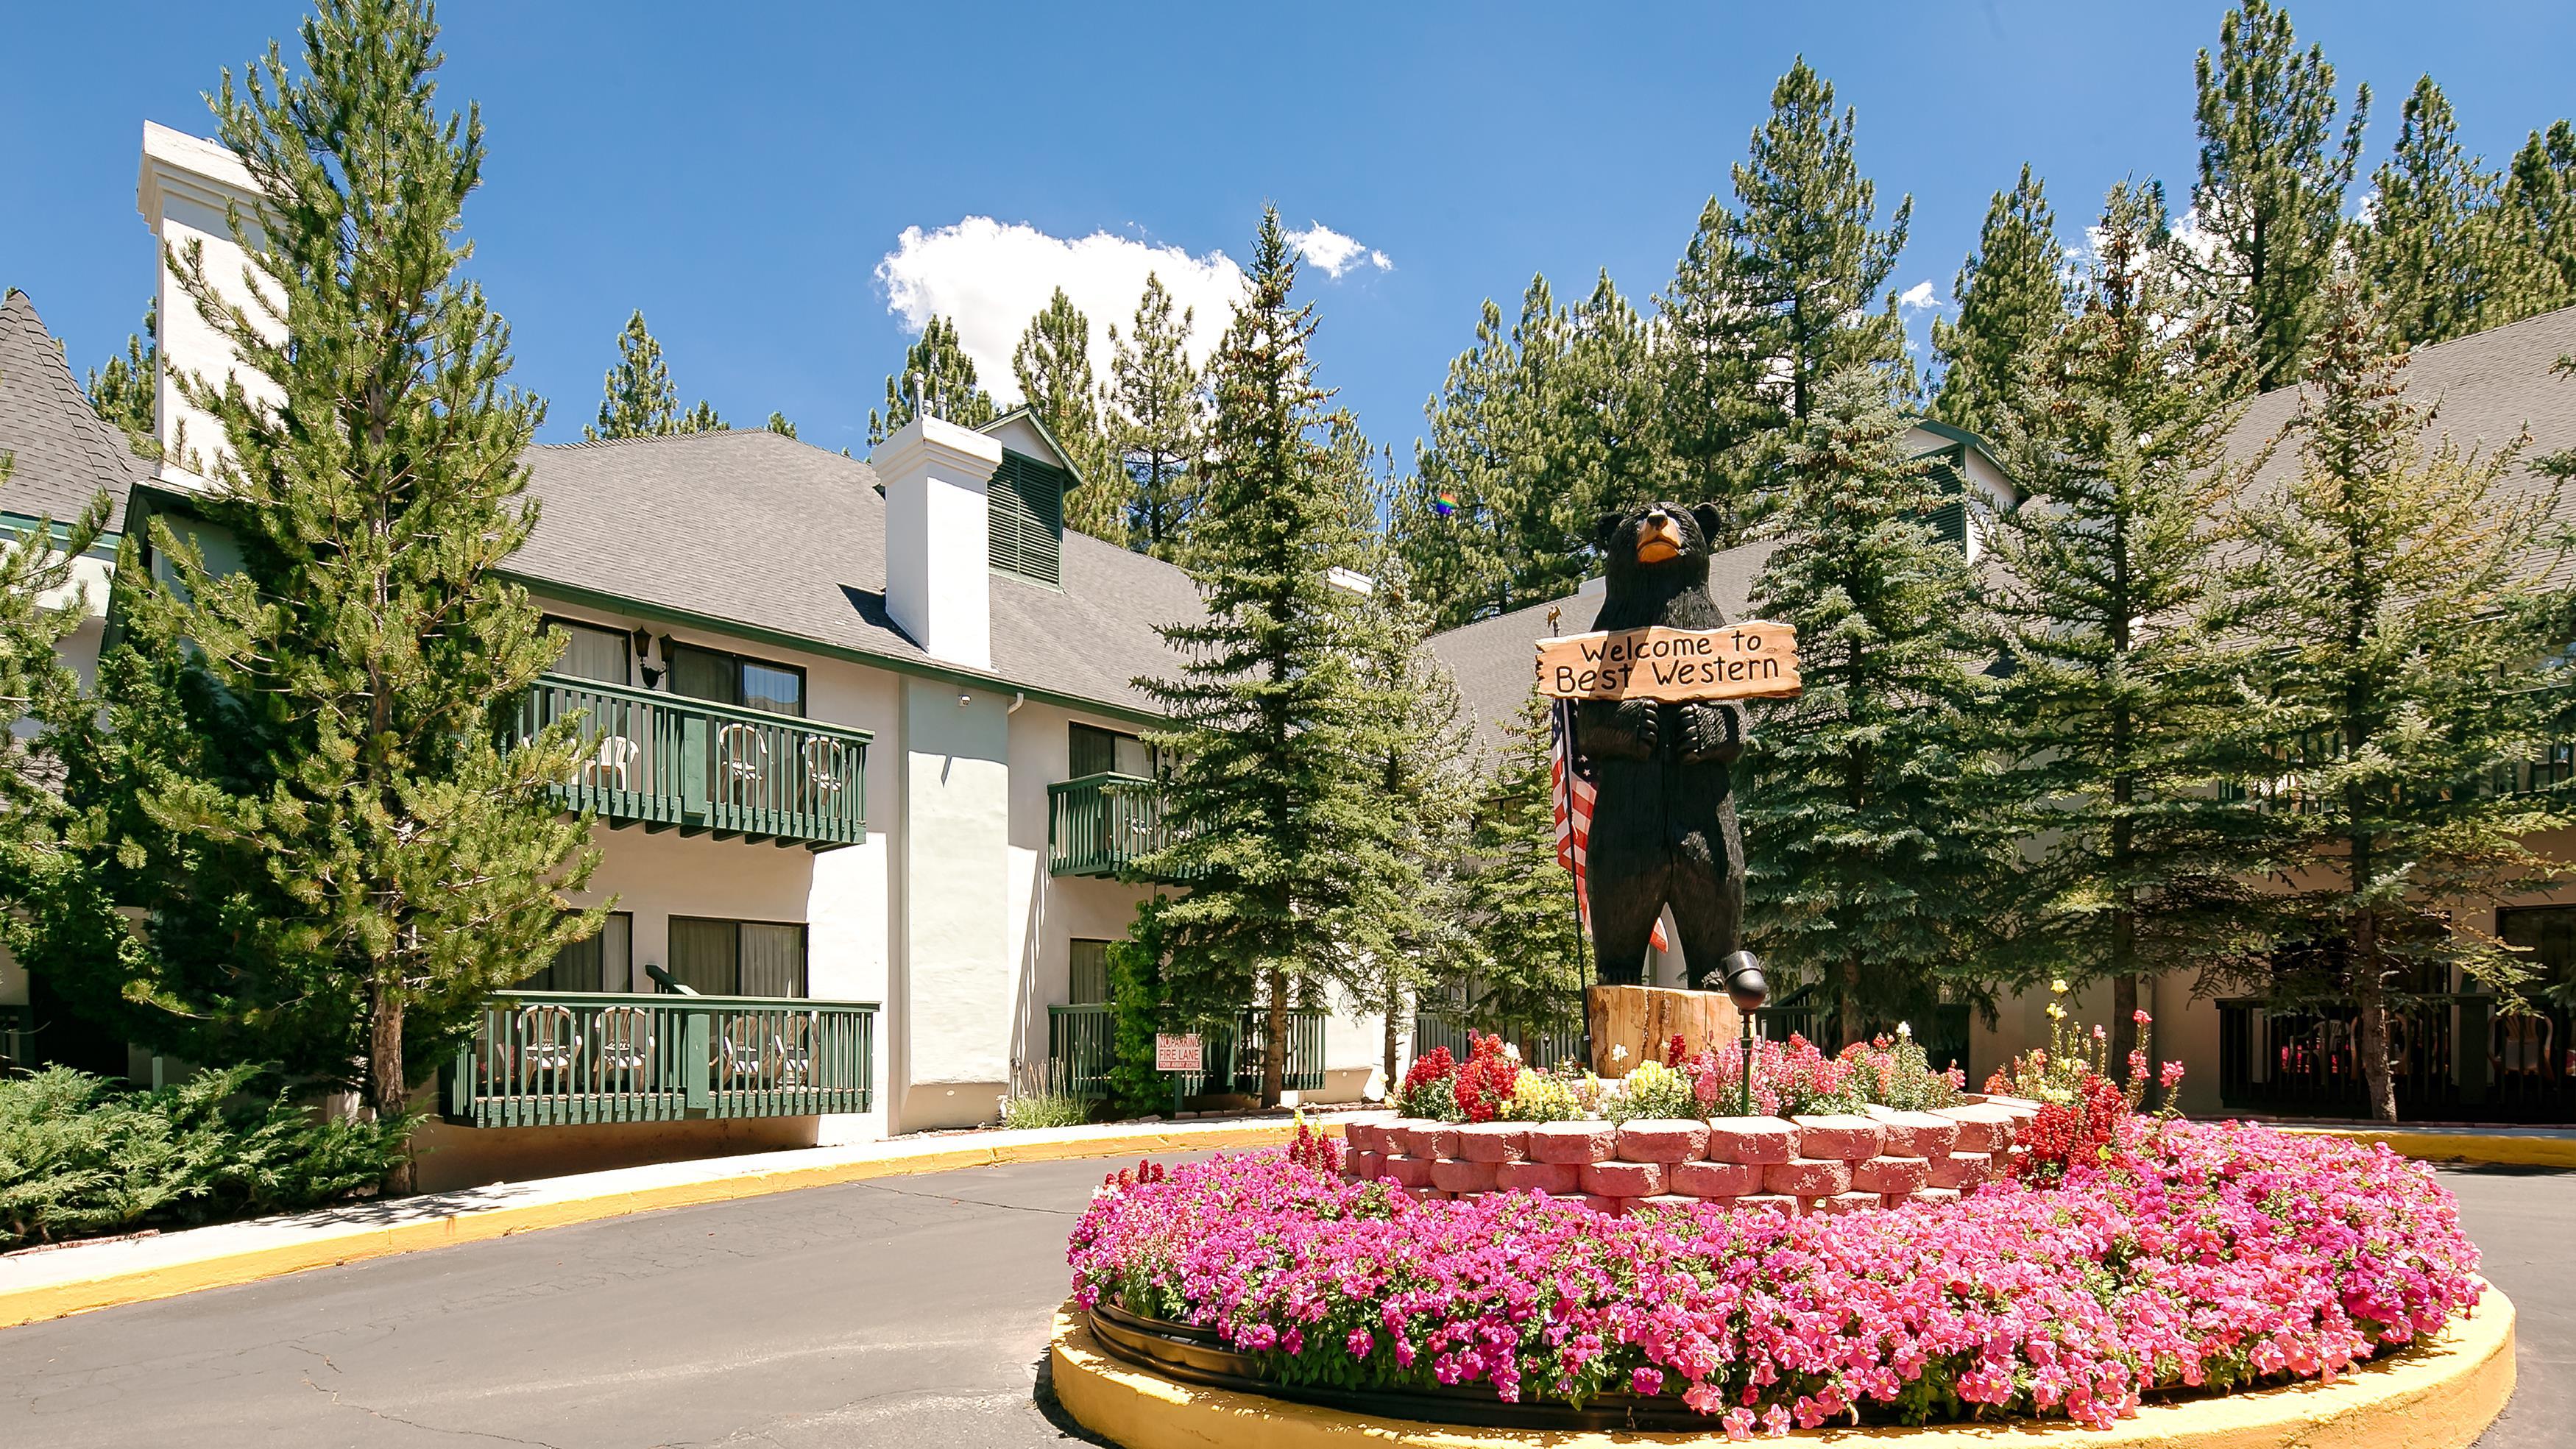 best western big bear chateau in big bear lake ca 909. Black Bedroom Furniture Sets. Home Design Ideas